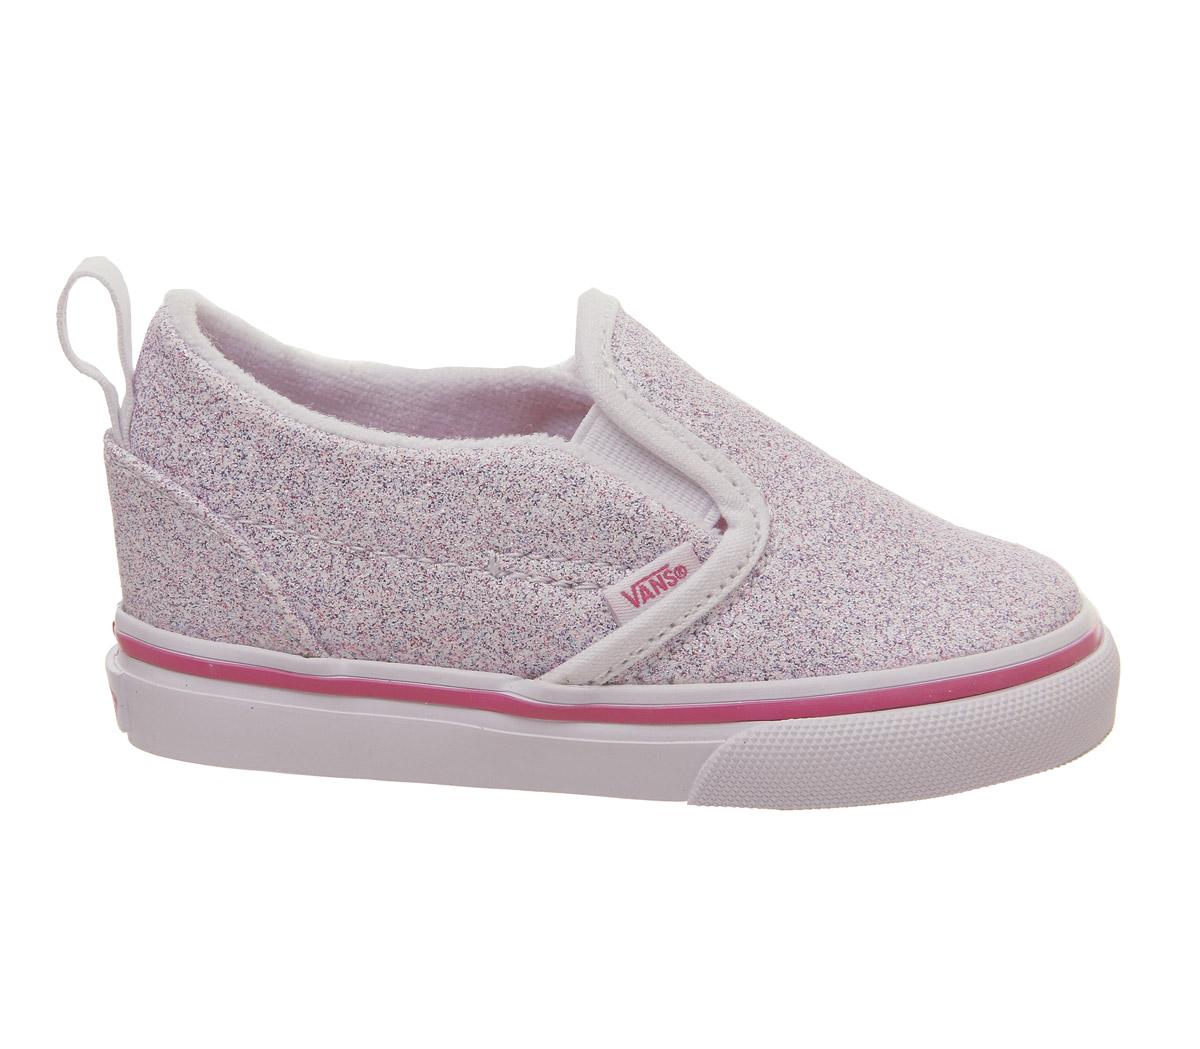 22e78b2e191 Sentinel Kids Vans Classic Slip On Toddlers True White Carmine Rose Glitter  Kids